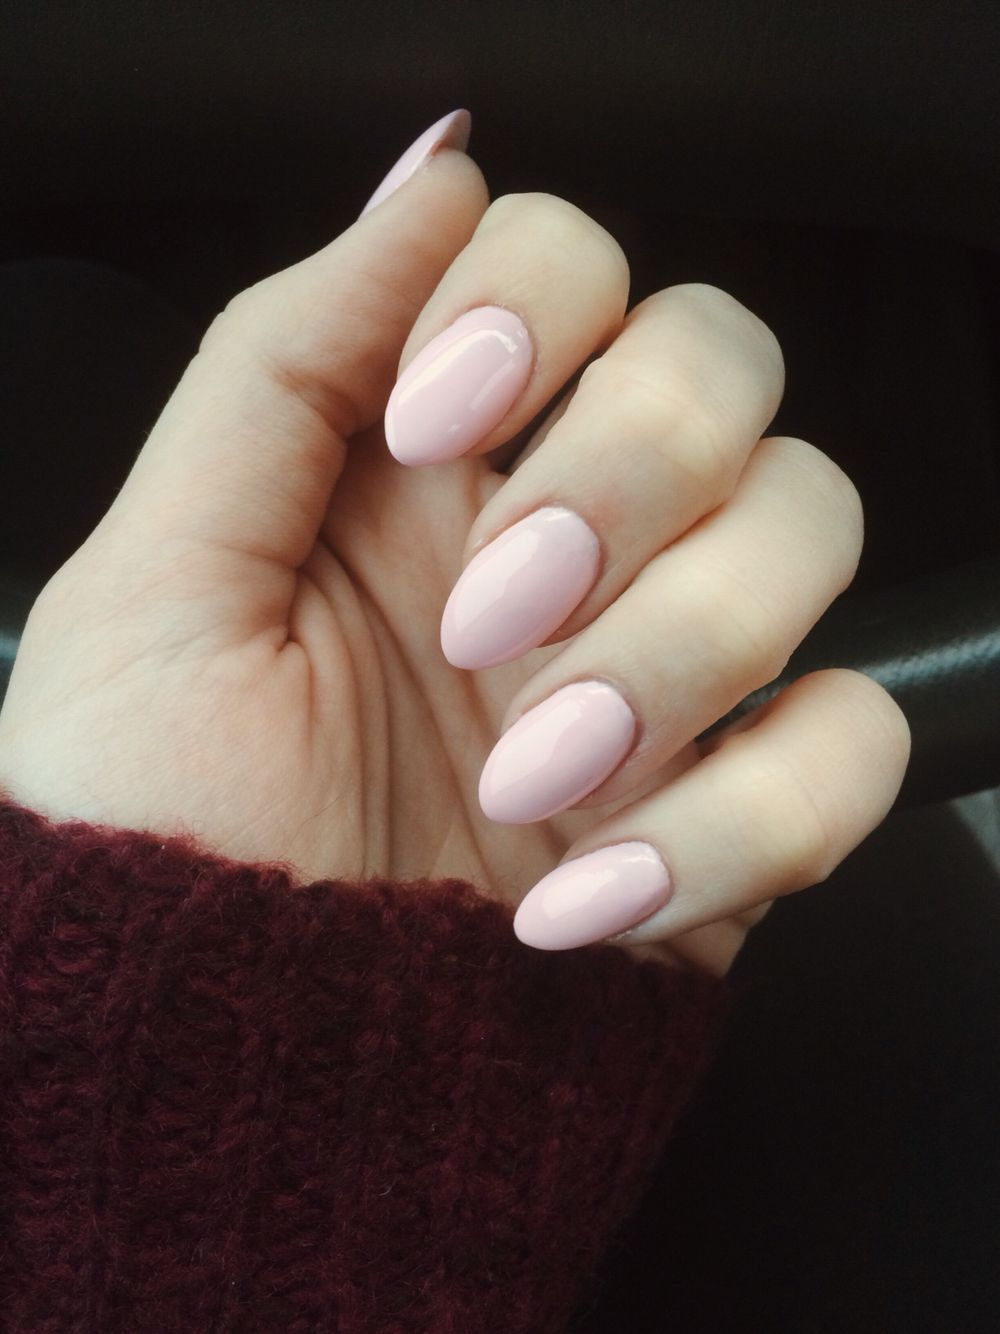 Almond Pink Acrylic Nails Instagram Amandabork Pinterest Amanderrplease Pink Acrylic Nails Types Of Nails Shapes Fake Nails